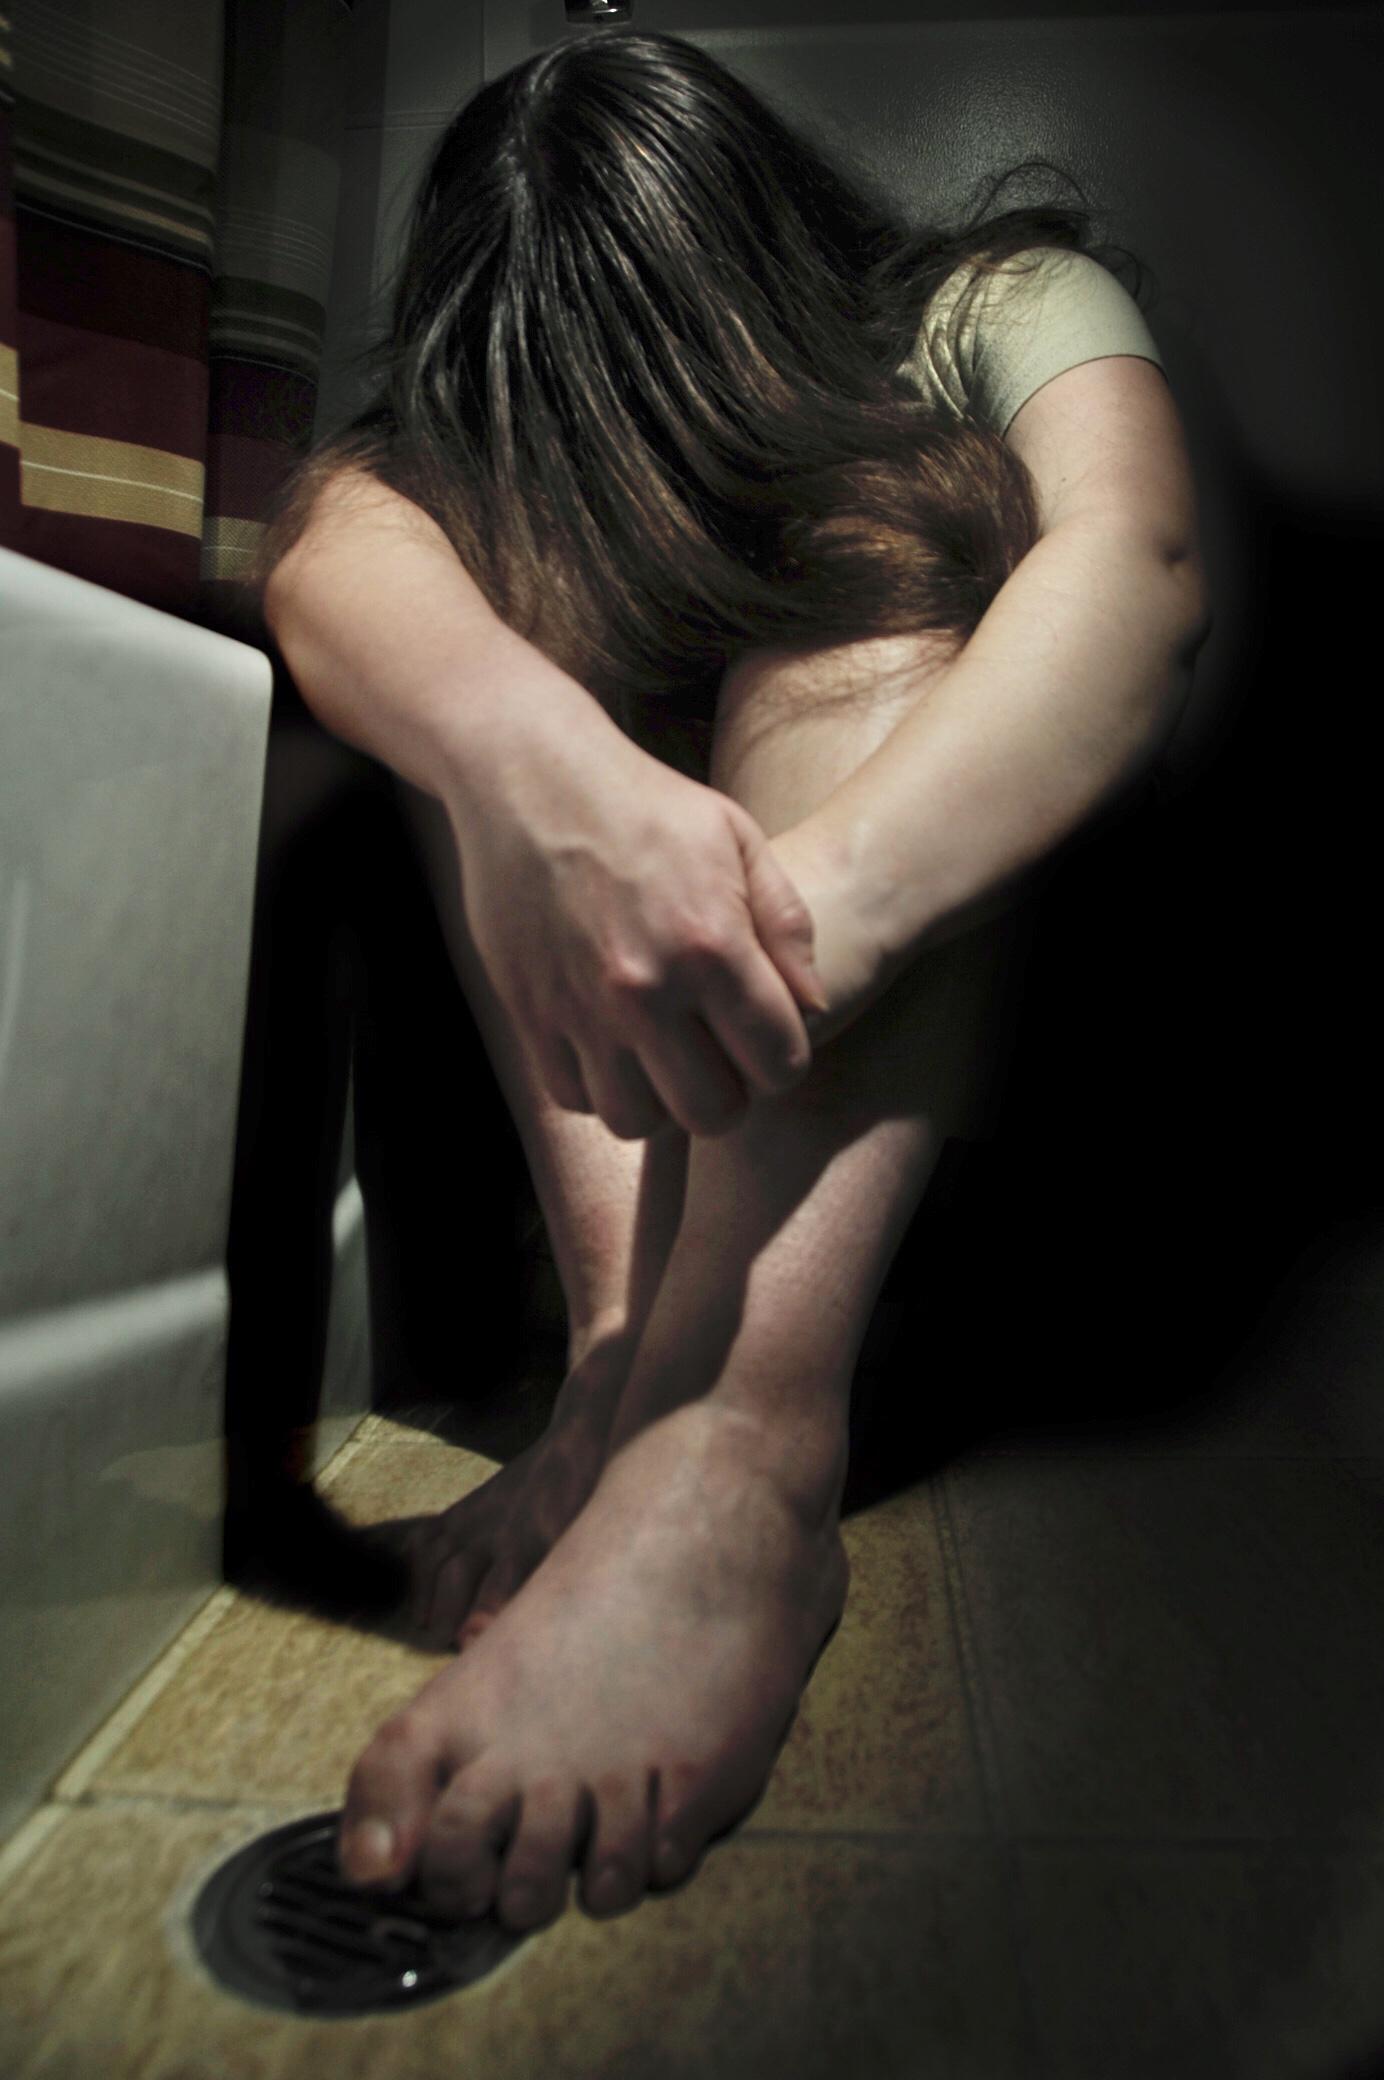 porn star mariska hagerty naked bondage